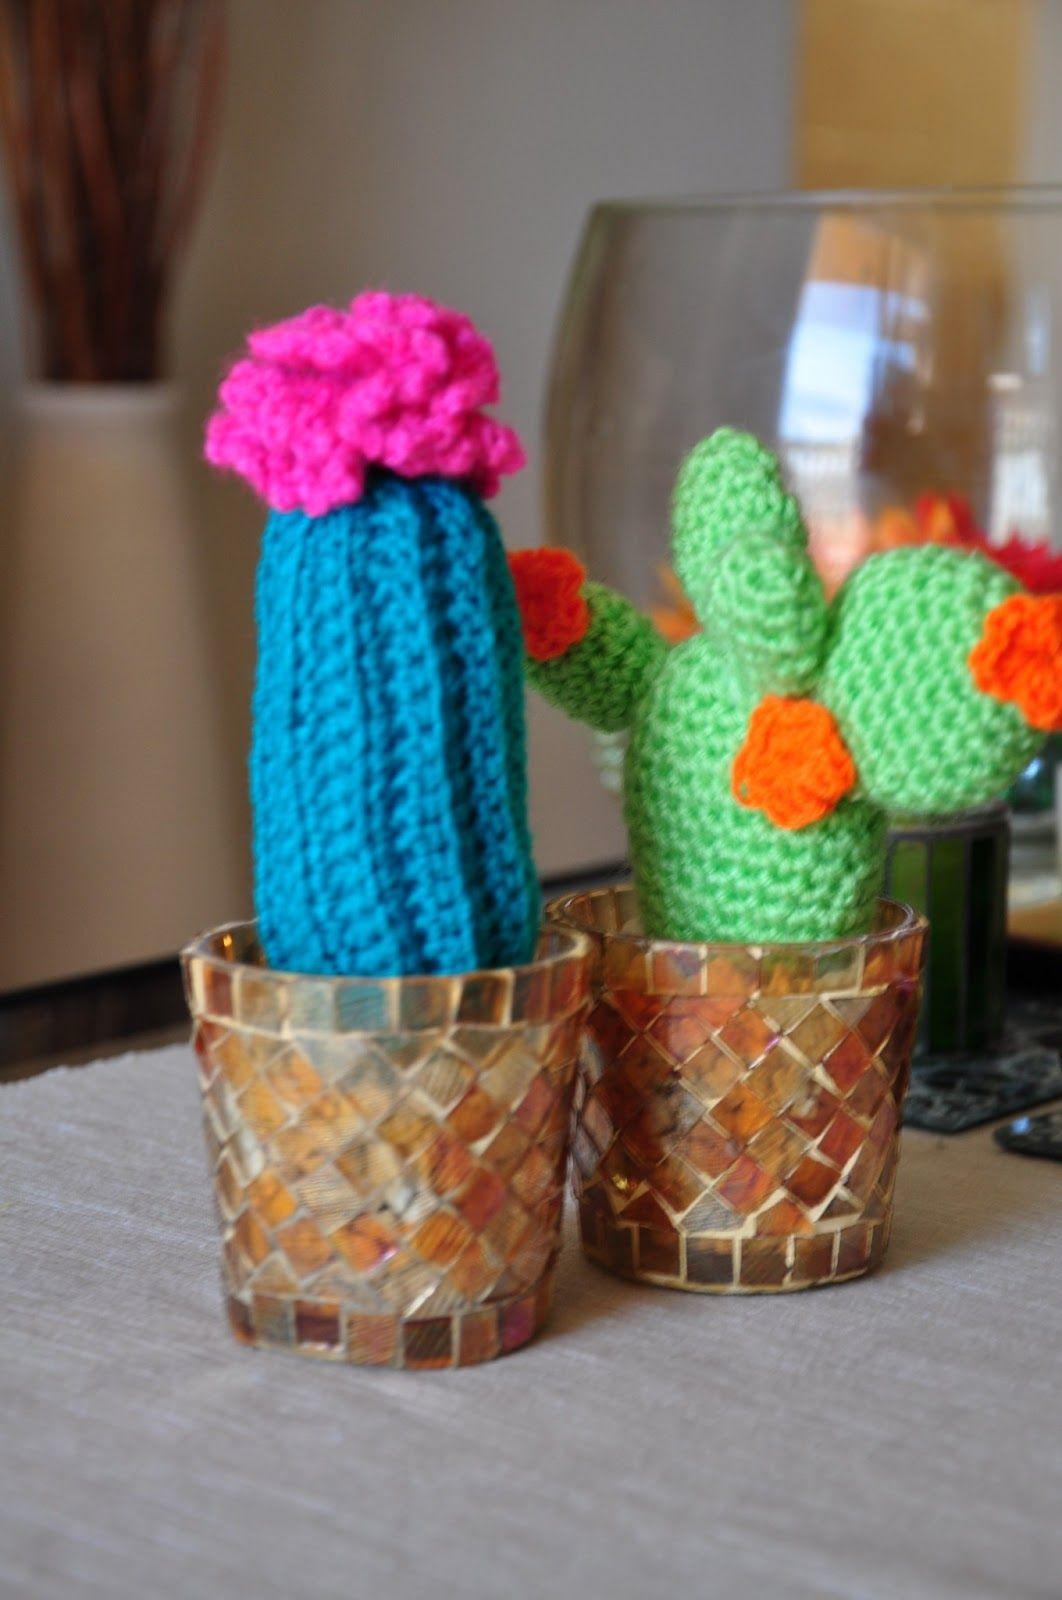 Amigurumi Cactus Tejiendo Peru : A blue Cactus, love it! Pattern by Tejiendo Peru, in ...